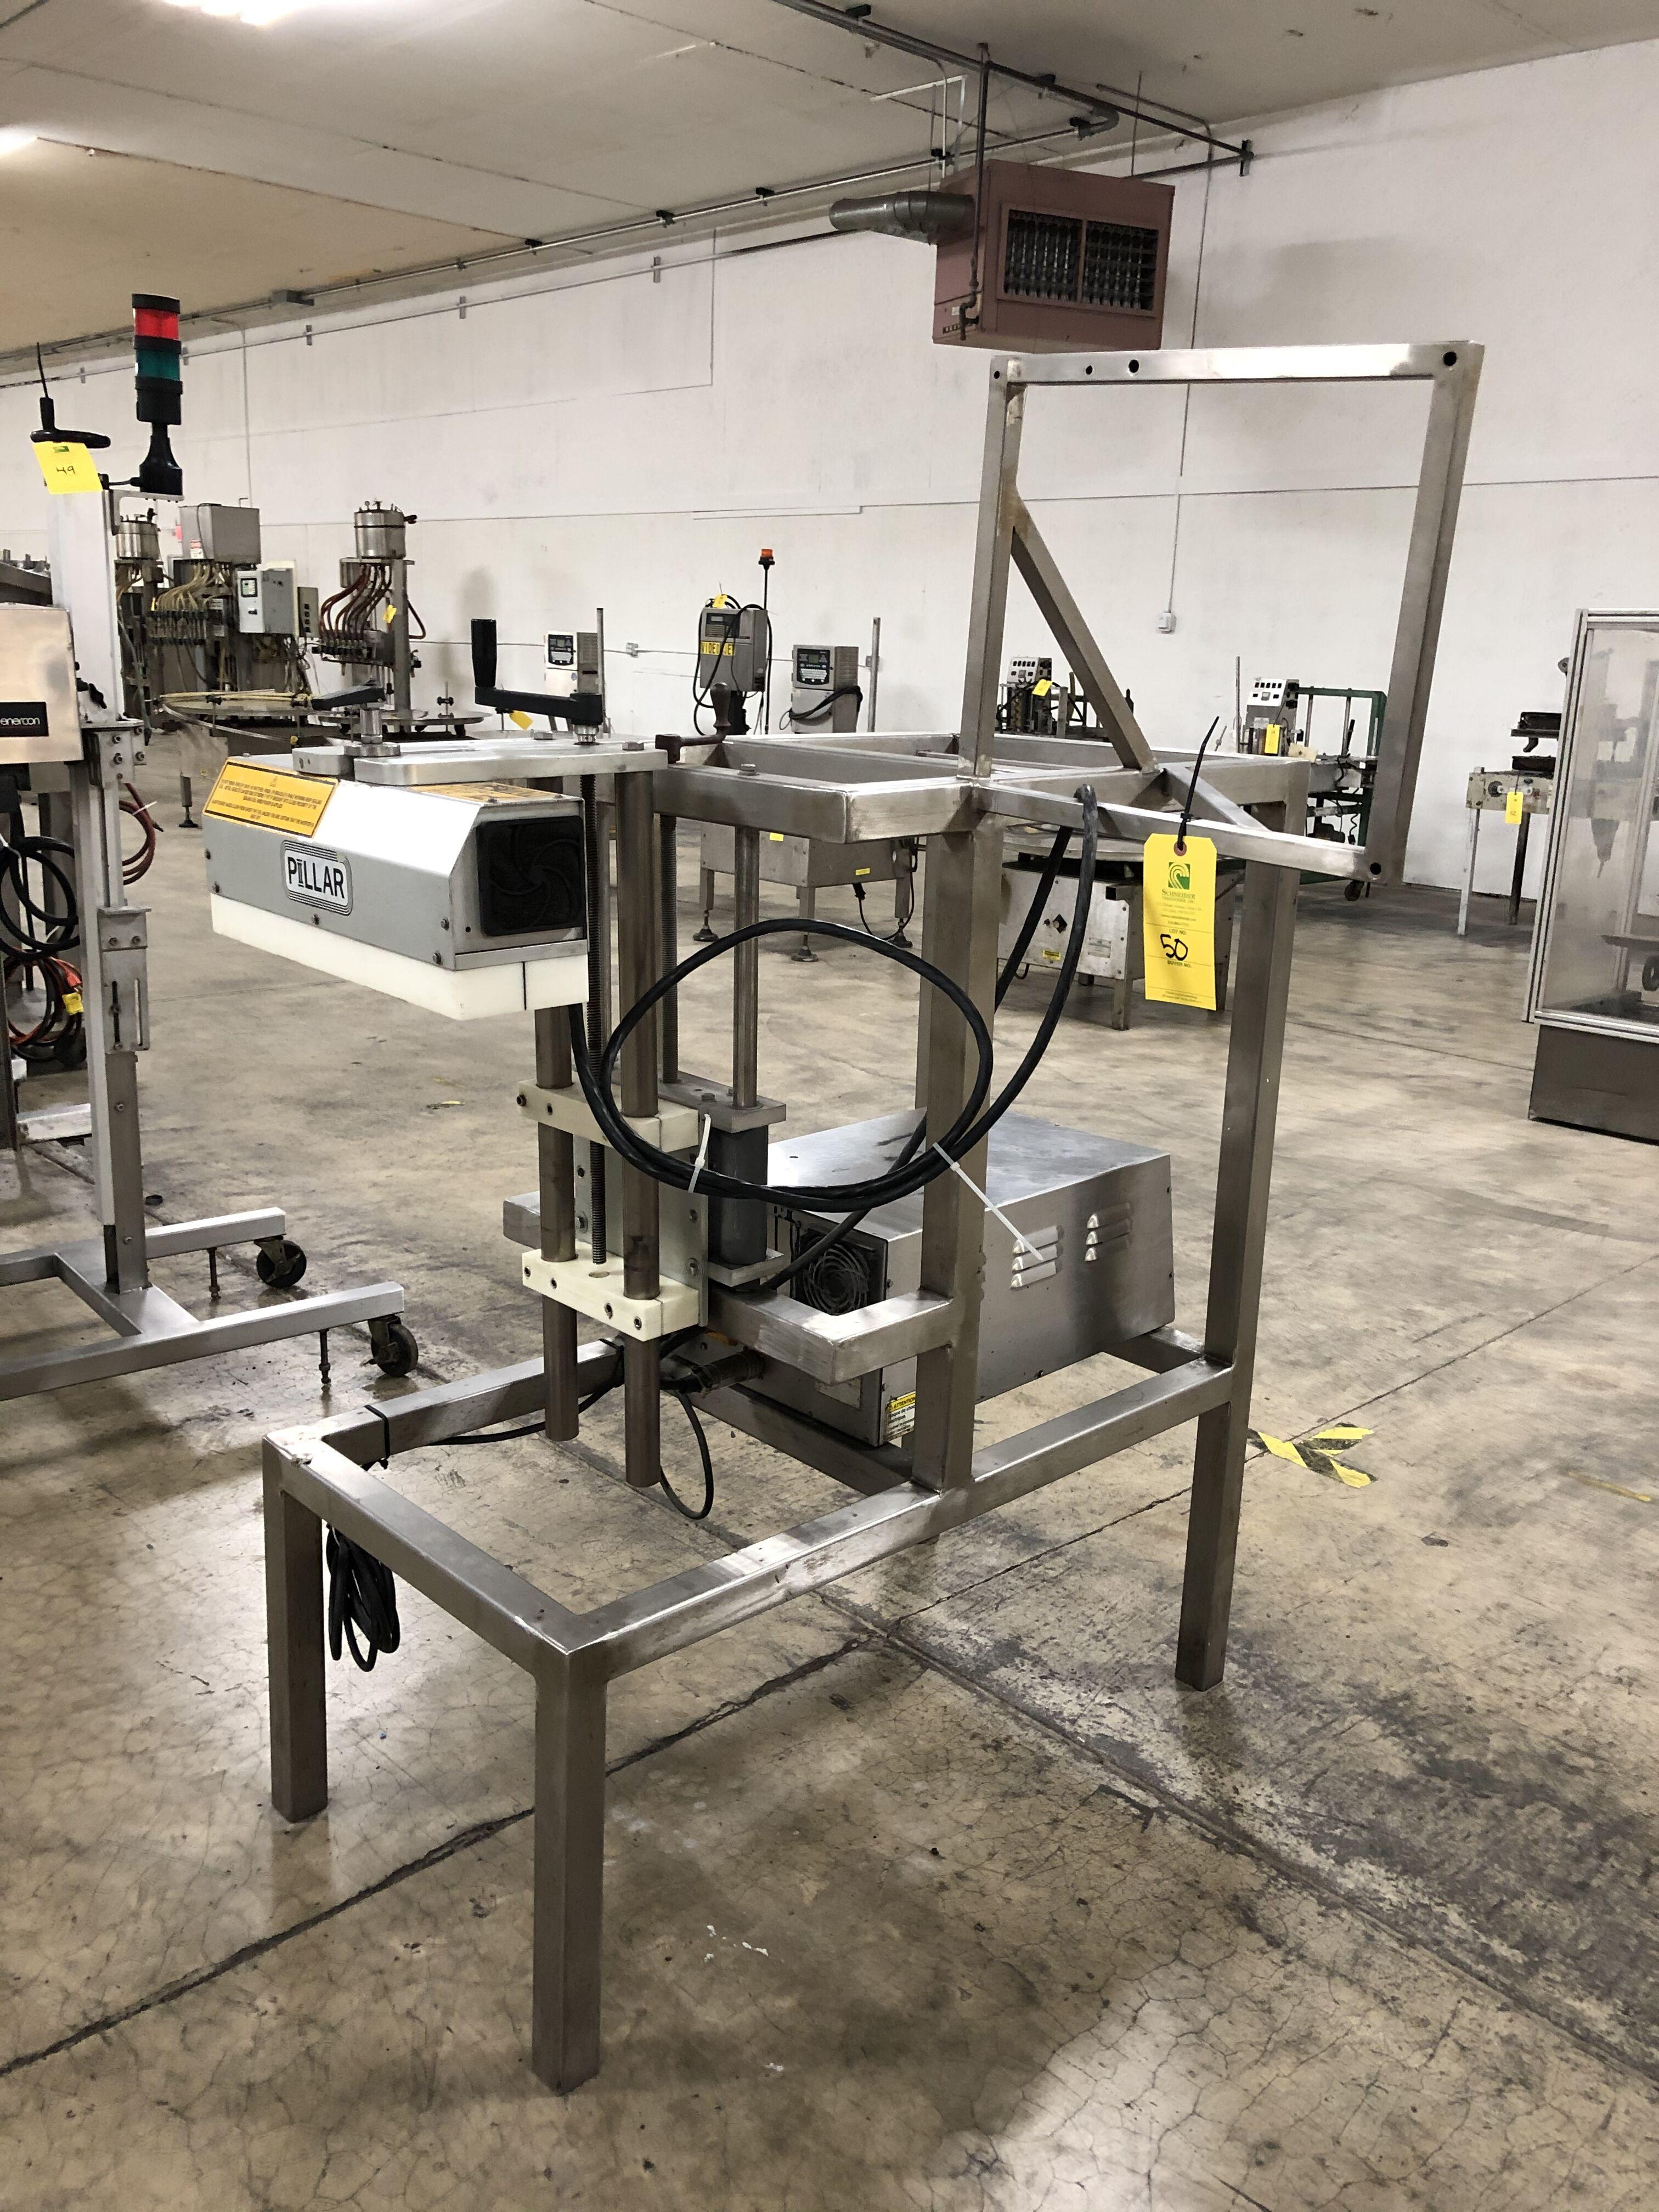 Pillar Technologies Unifoiler Cap Sealing Machine, Model #U1P1001000000, DOM April 2009 - Image 3 of 7